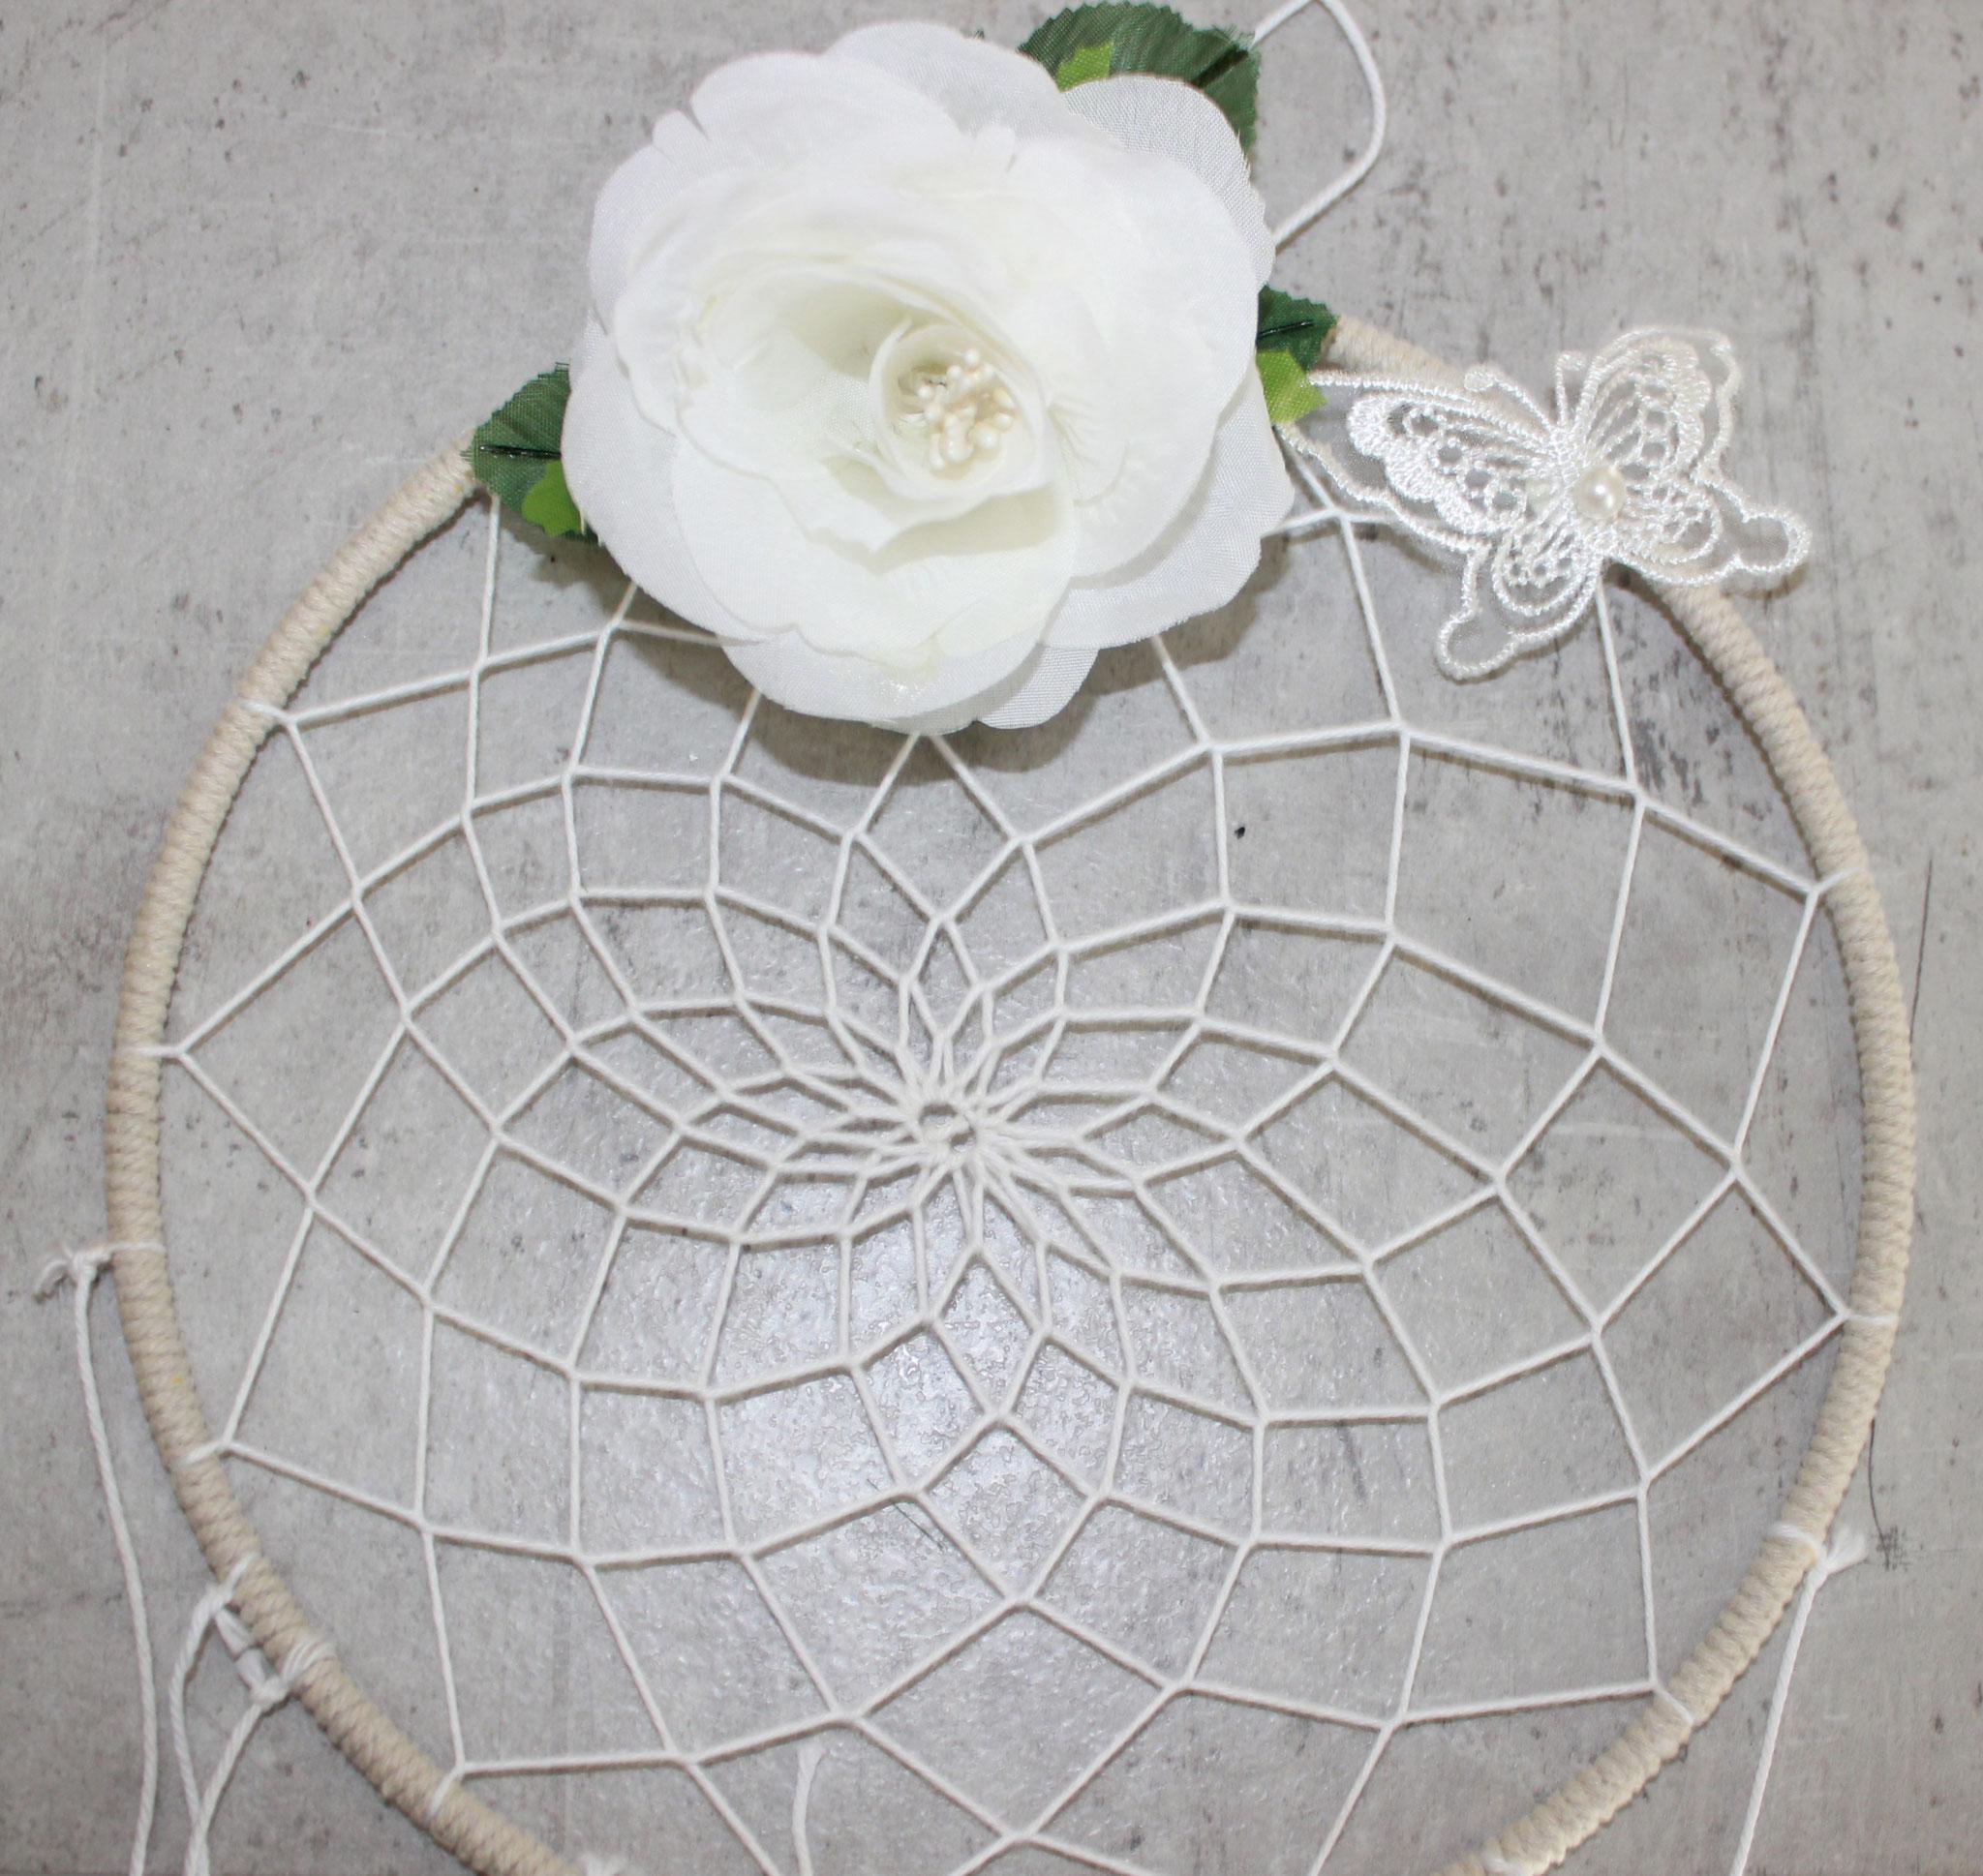 Kit DIY attrape rêve floral